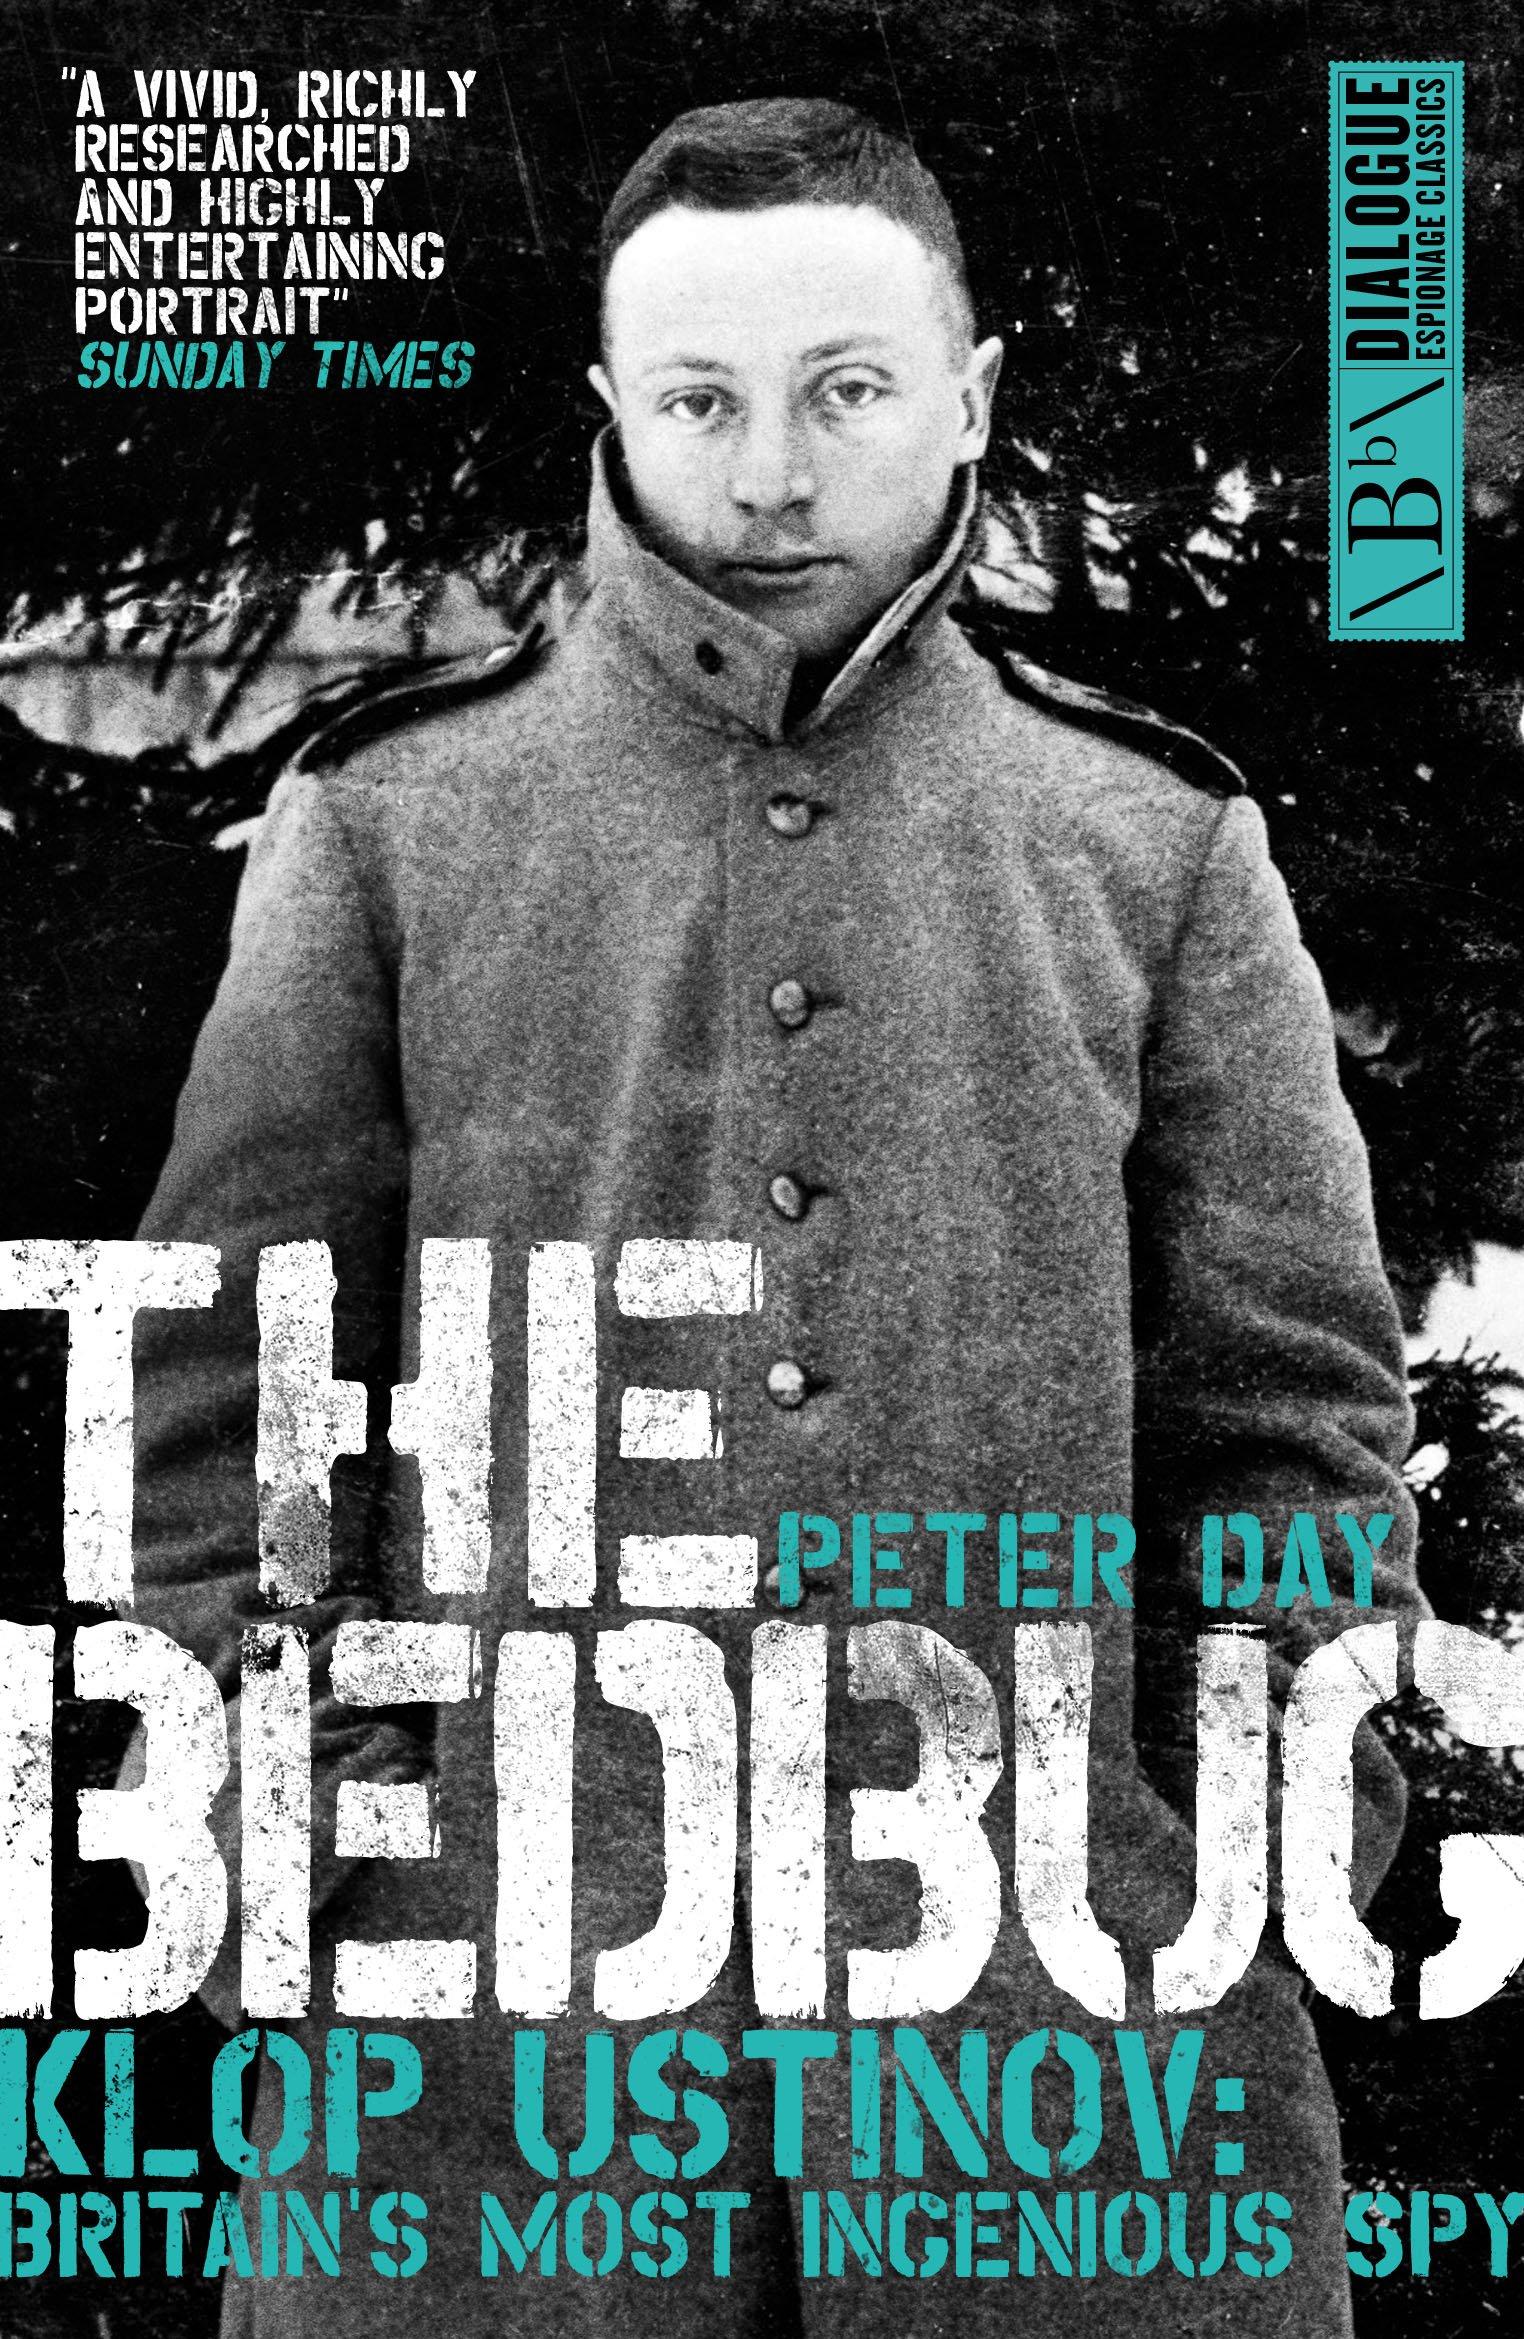 Download The Bedbug: Klop Ustinov - Britain's Most Ingenious Spy (Dialogue Espionage Classics) ebook